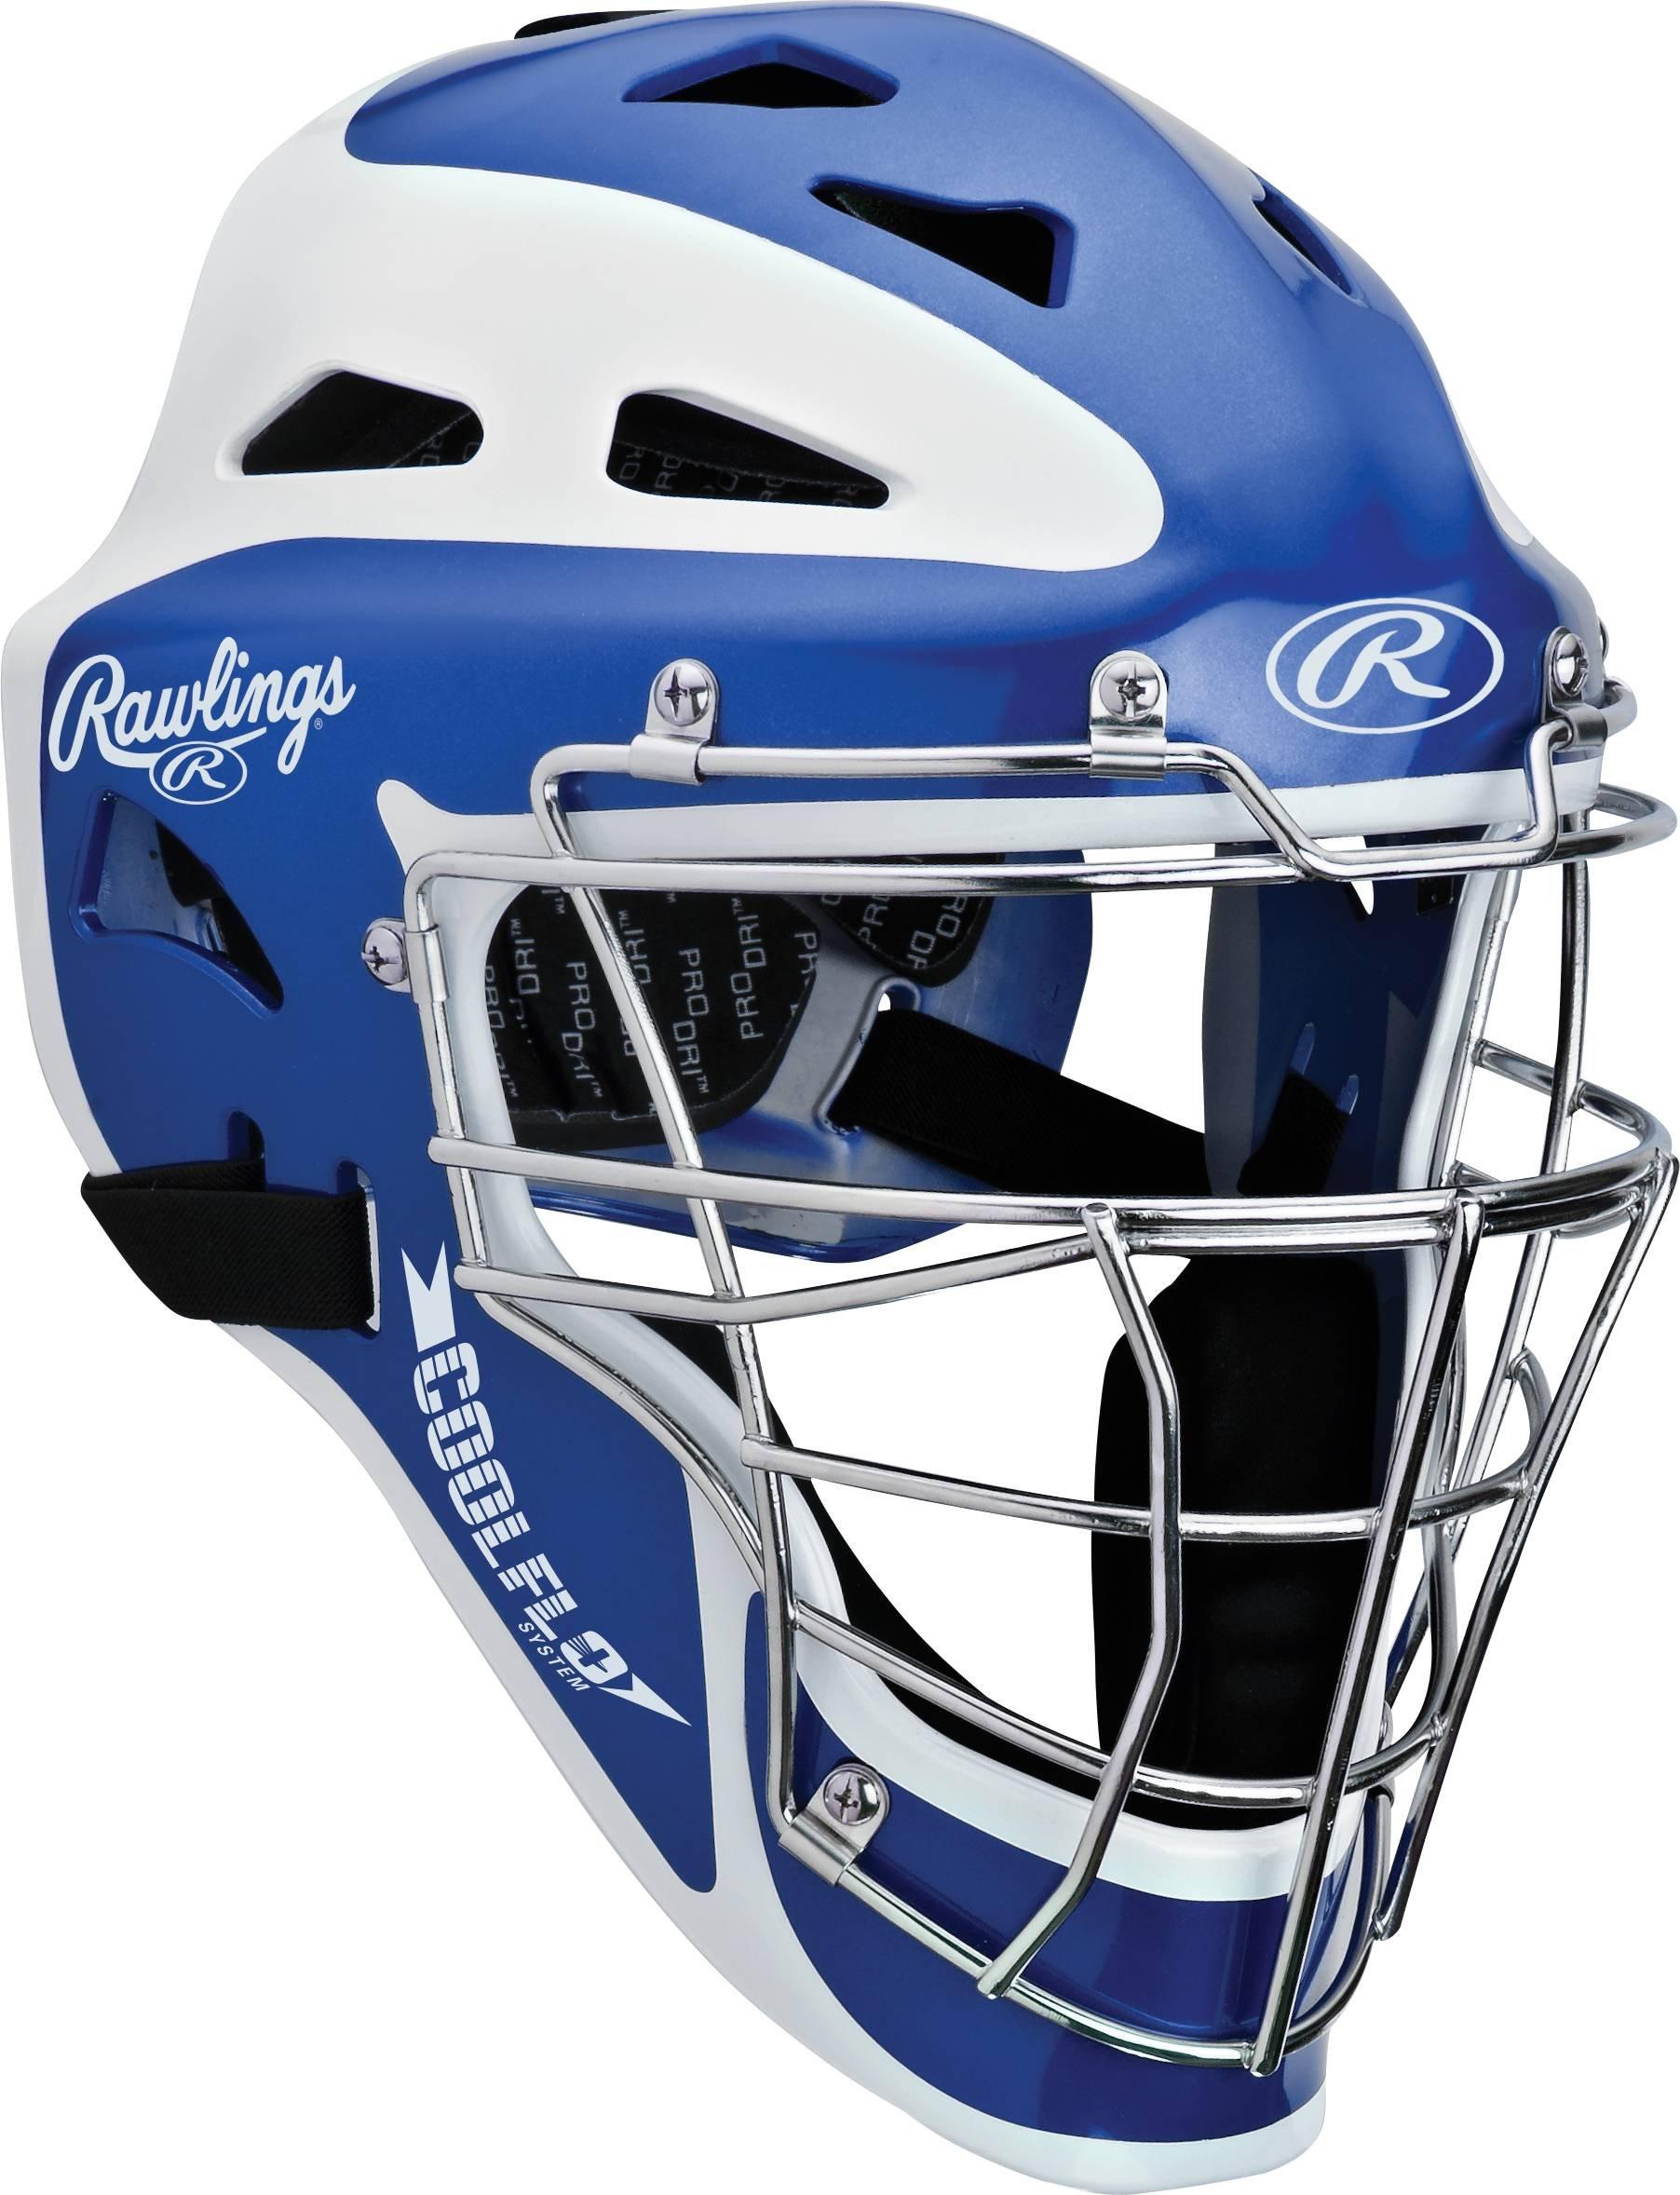 Rawlings Two-Tone Translucent Matte Hockey Style Catchers Mask, Royal by Rawlings